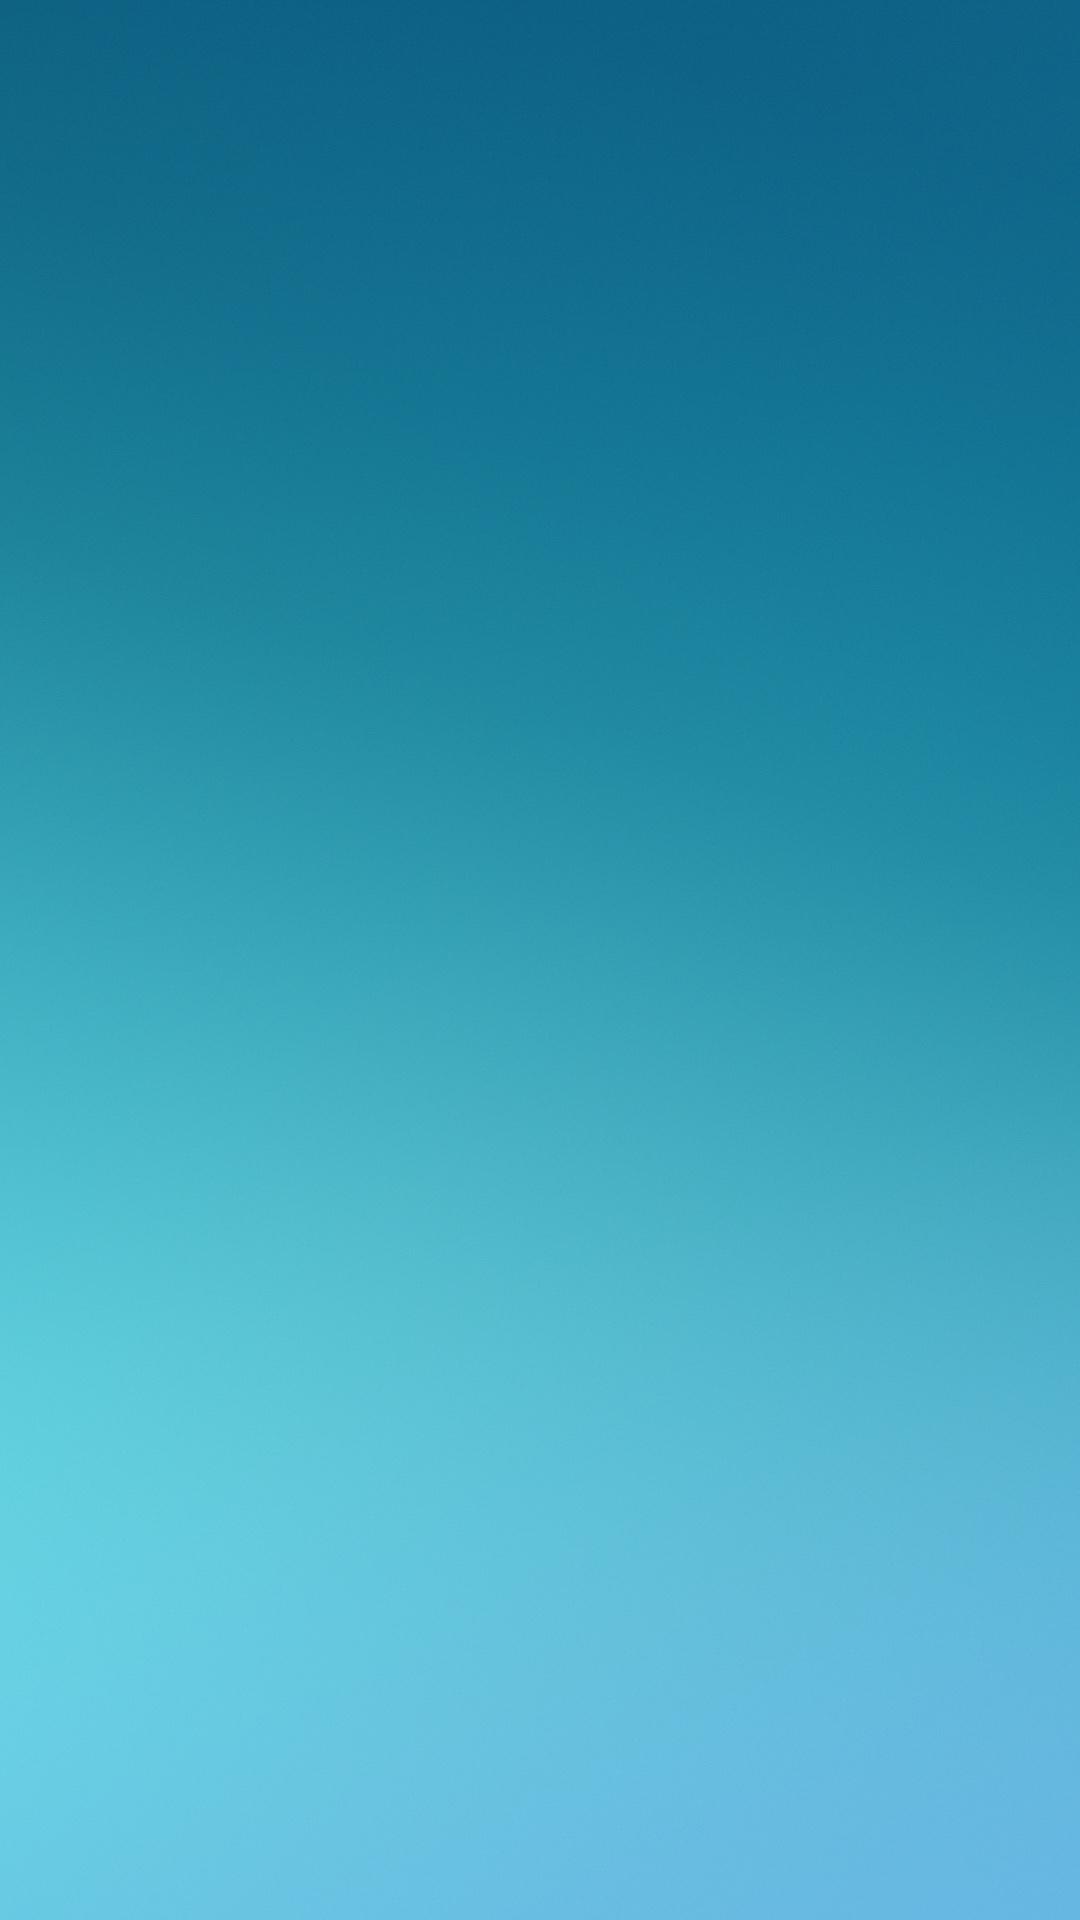 Download Miui 9 Xiaomi Mi 4c And Mi 5x Stock Wallpapers Droidviews